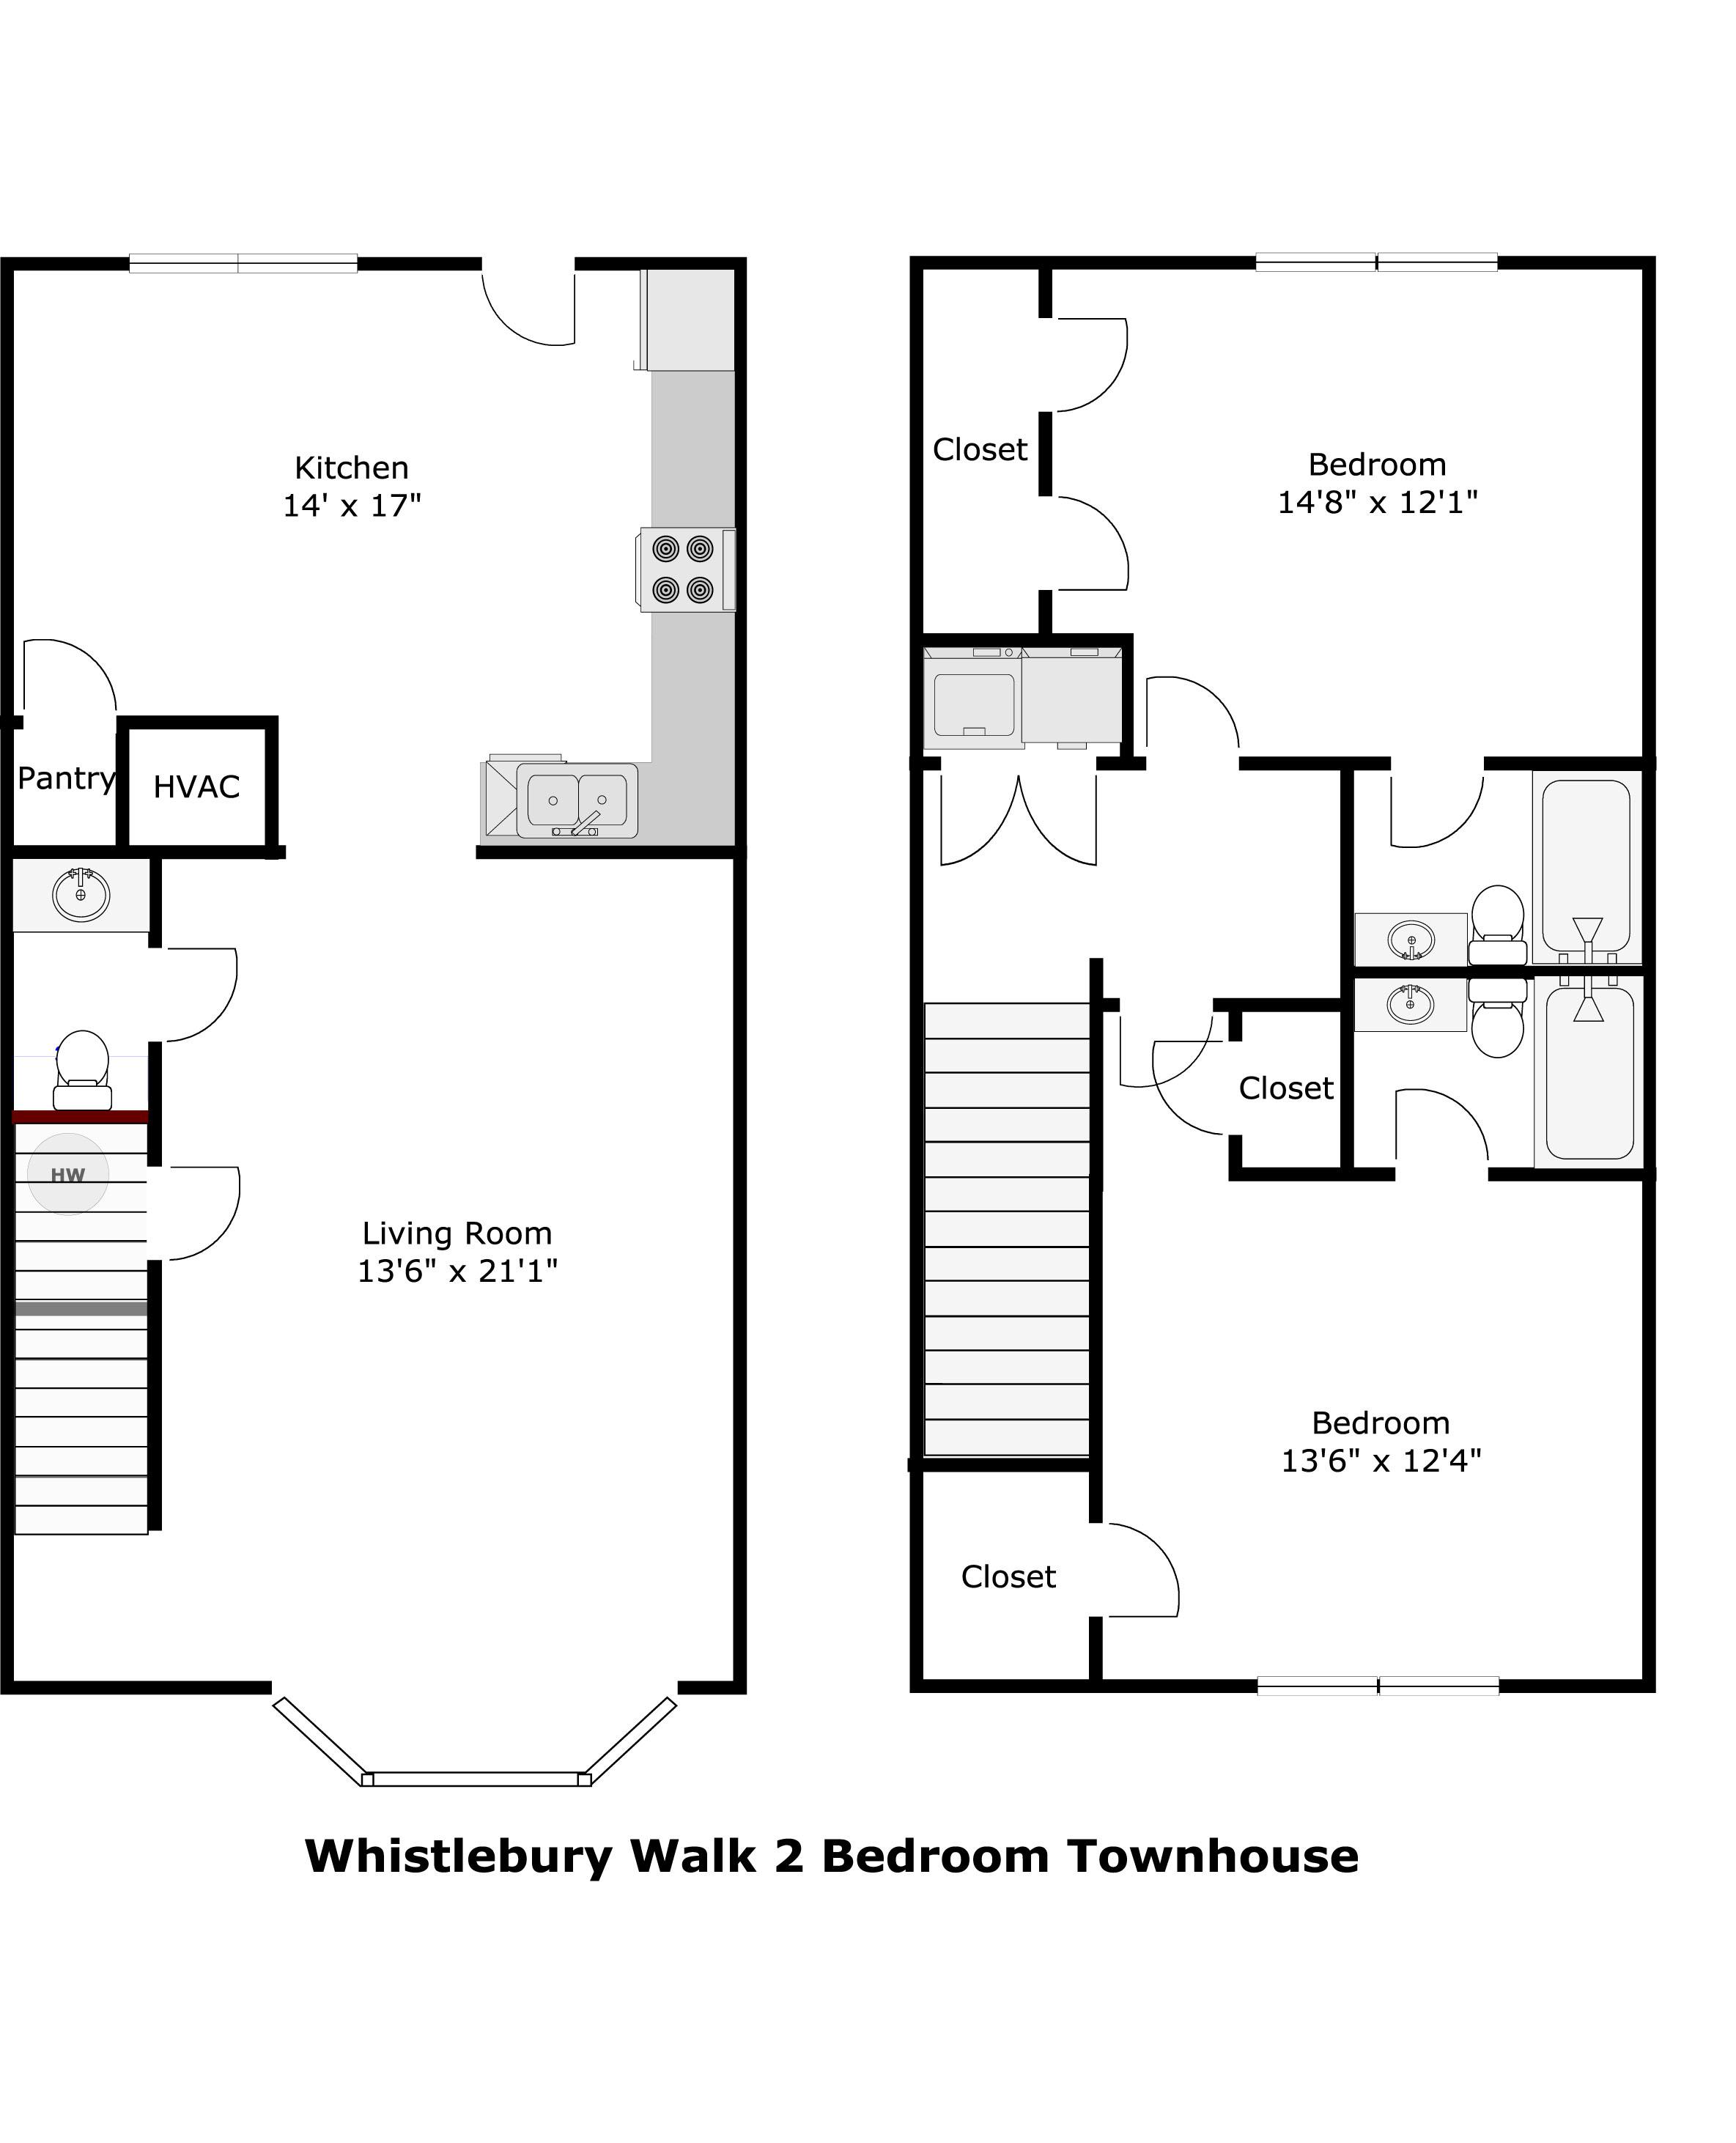 Whistlebury walk apartments in athens georgia for Small rental house plans